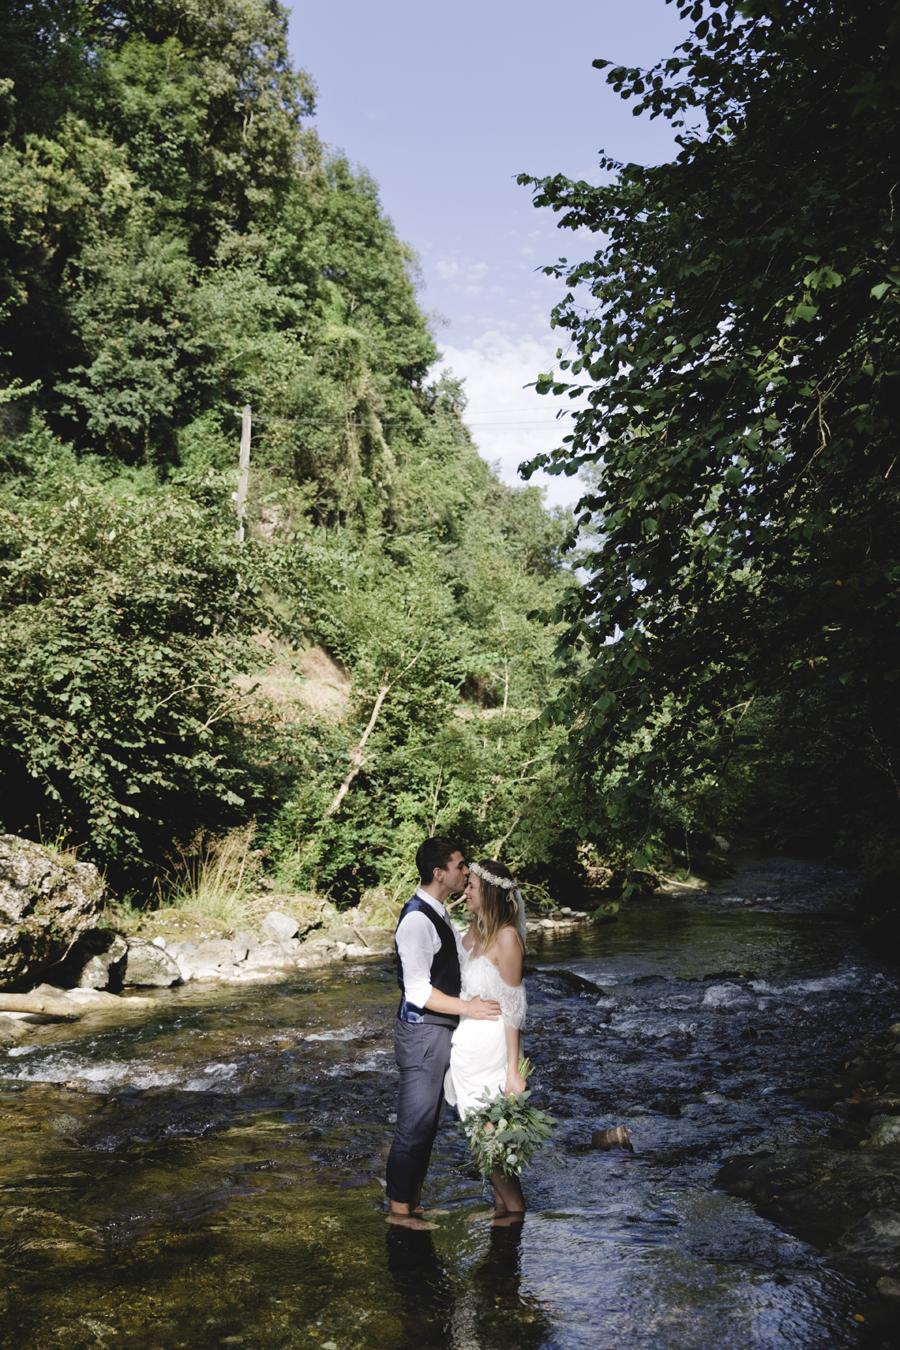 celine_marks_mariage_aurelie_keil_79